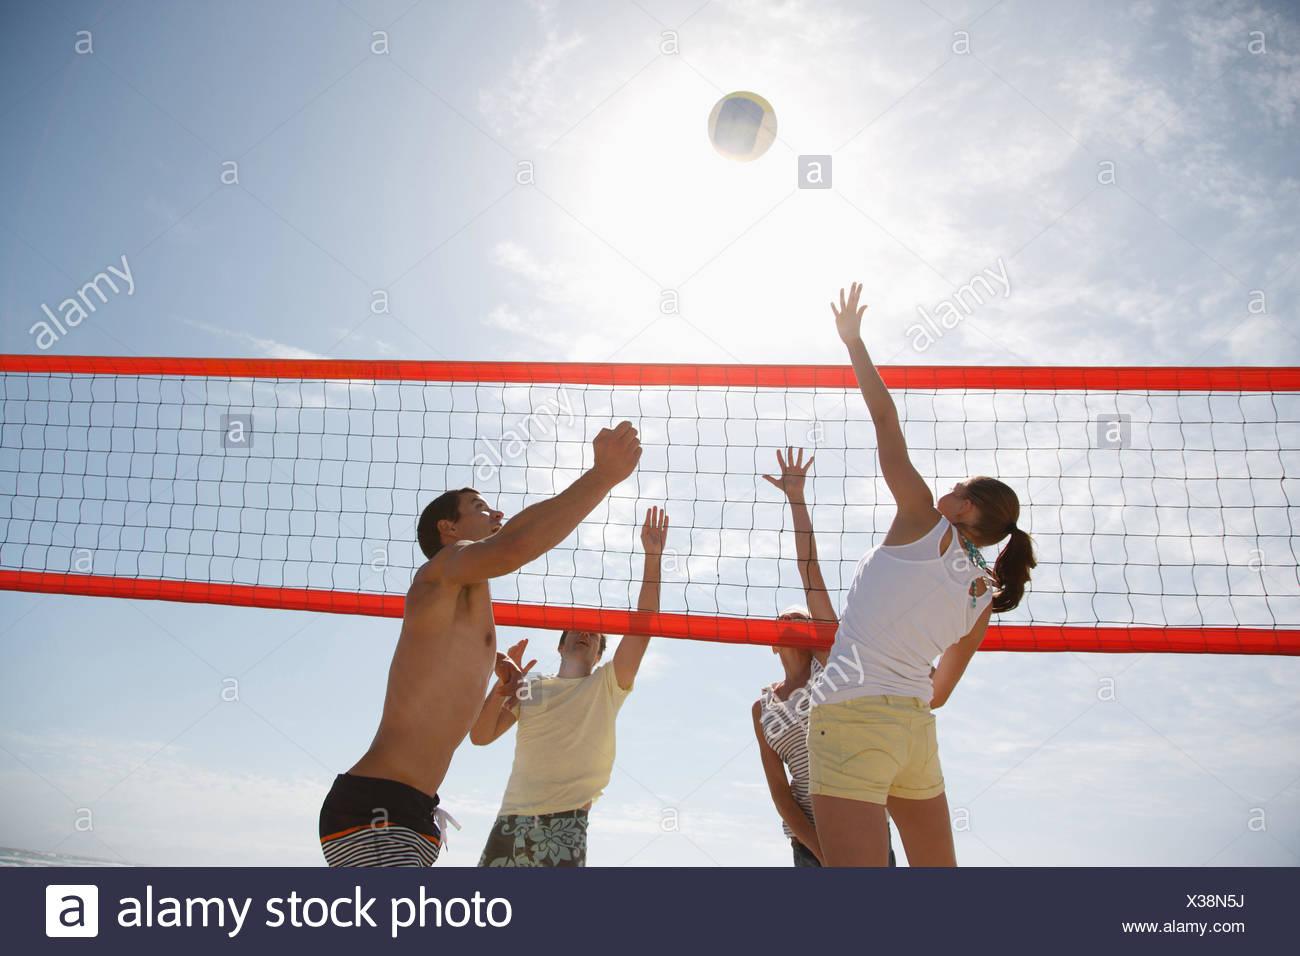 Freunden Volleyball spielen Stockbild